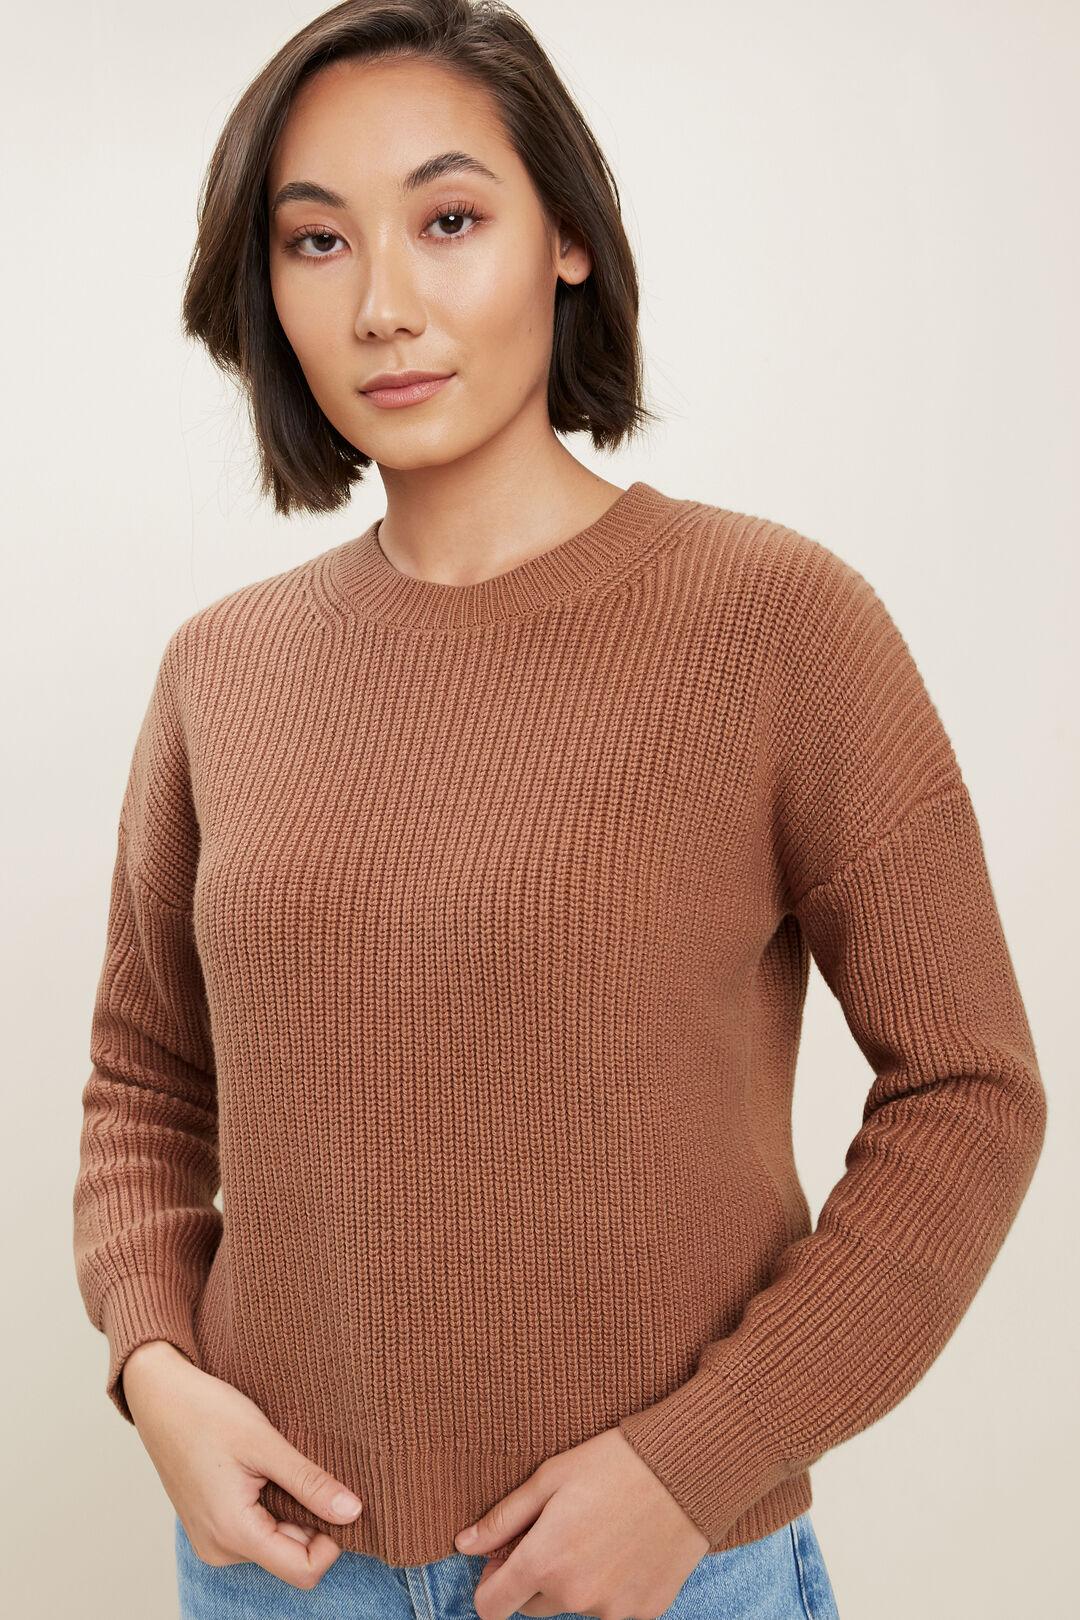 Fisherman Knit Sweater  BURNT SIENNA  hi-res